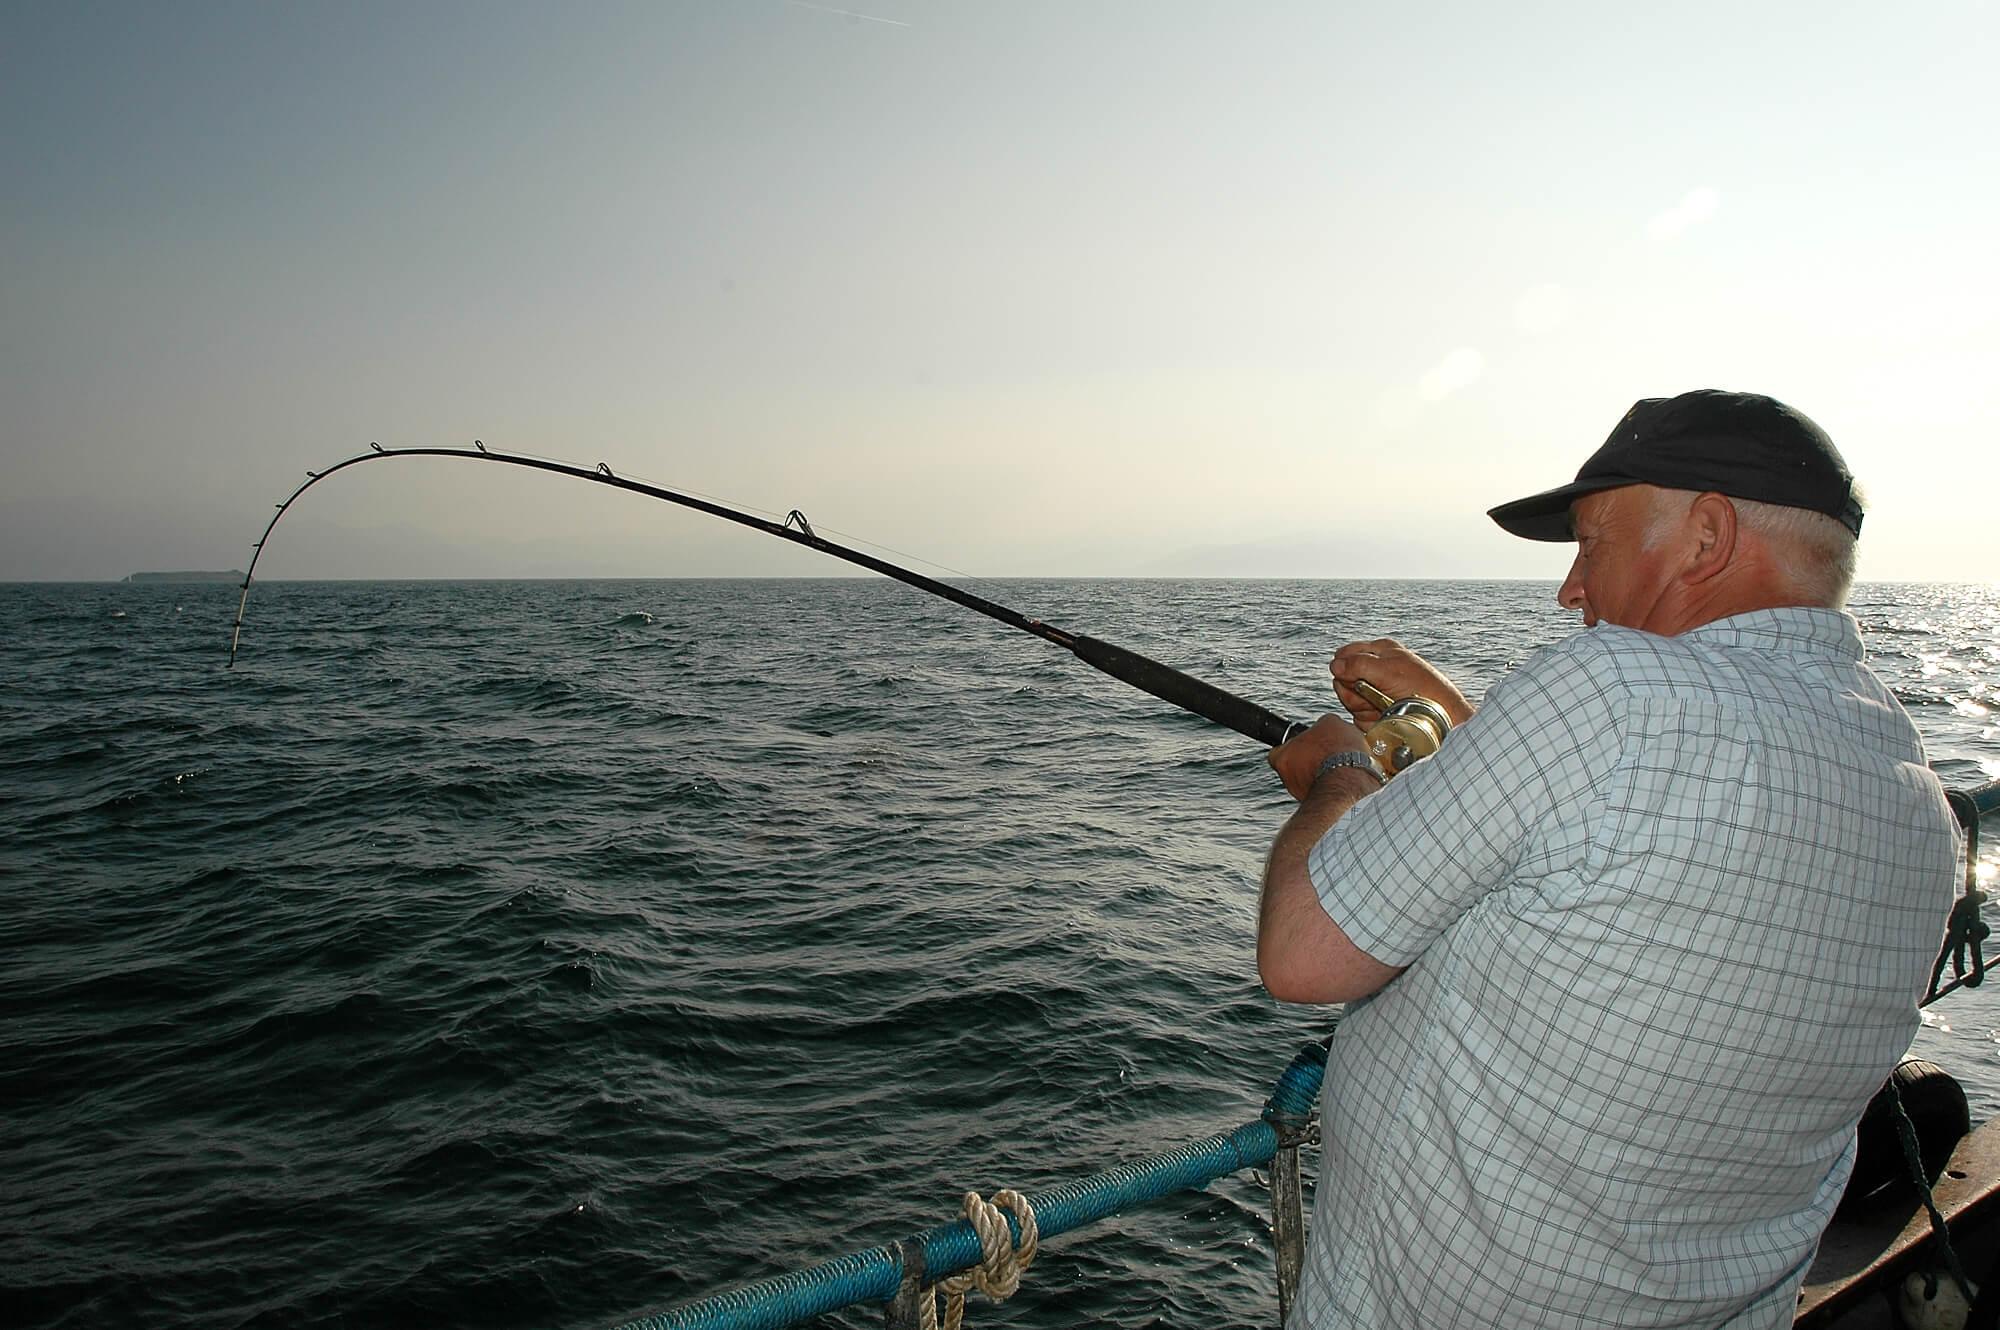 Gurnard fishing tackle